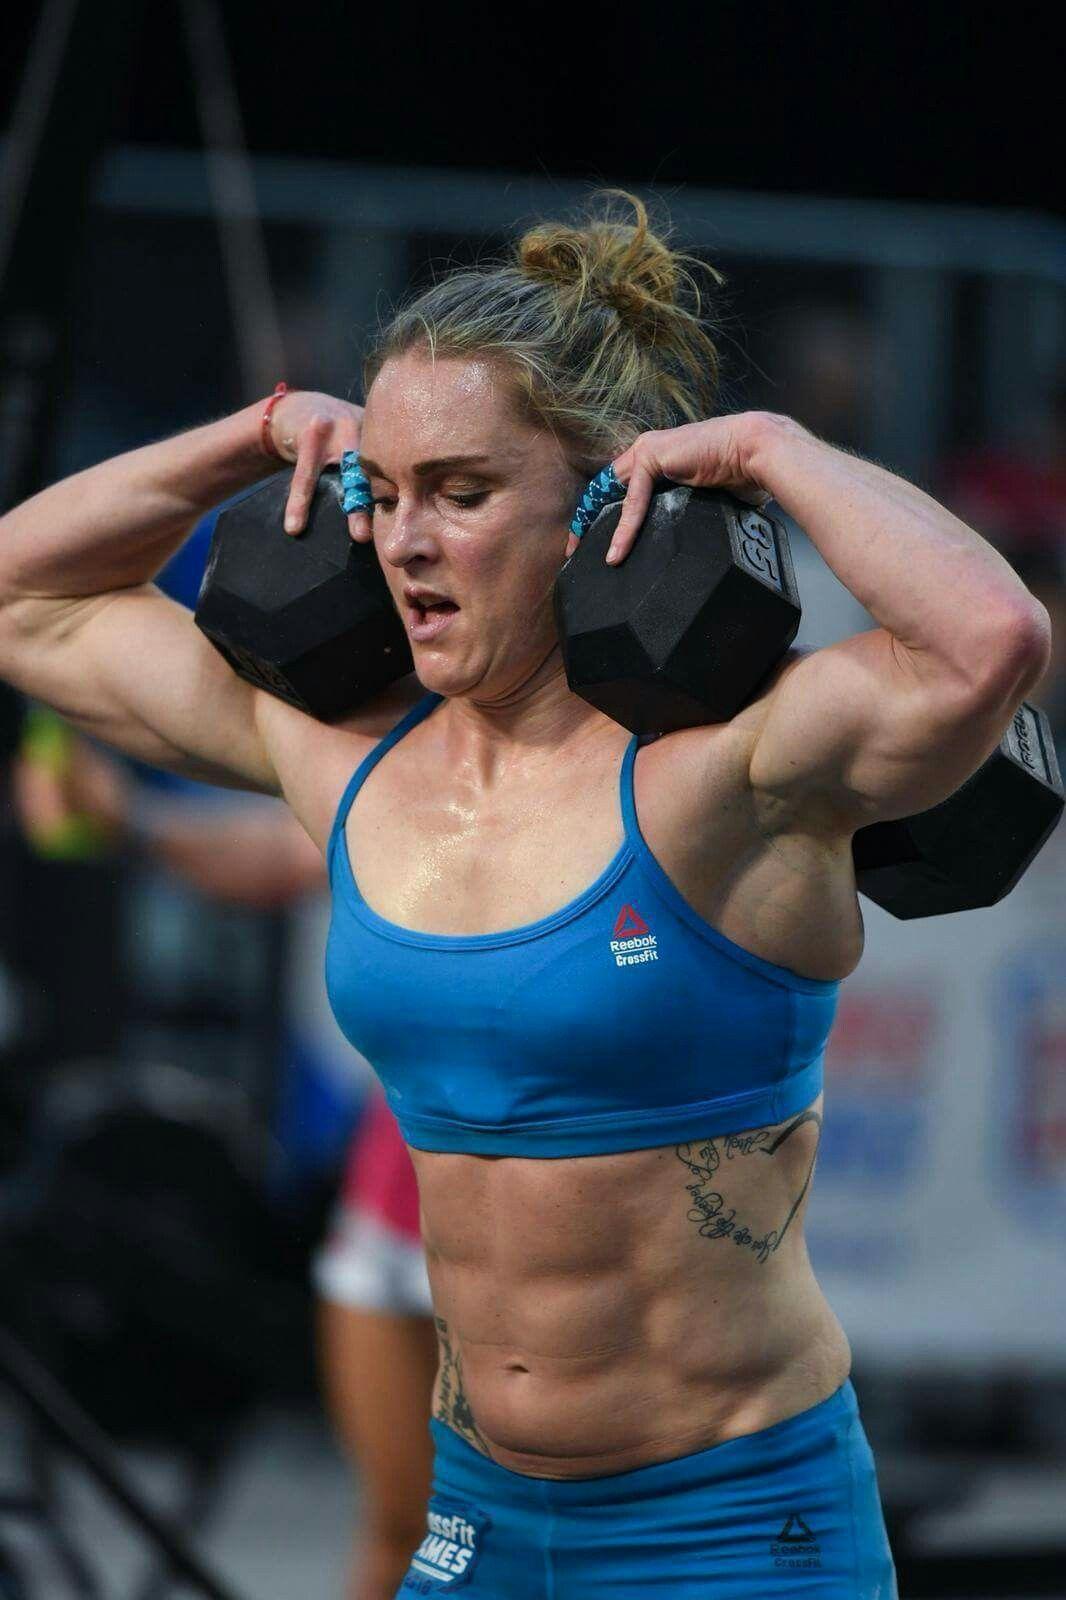 Samantha Briggs